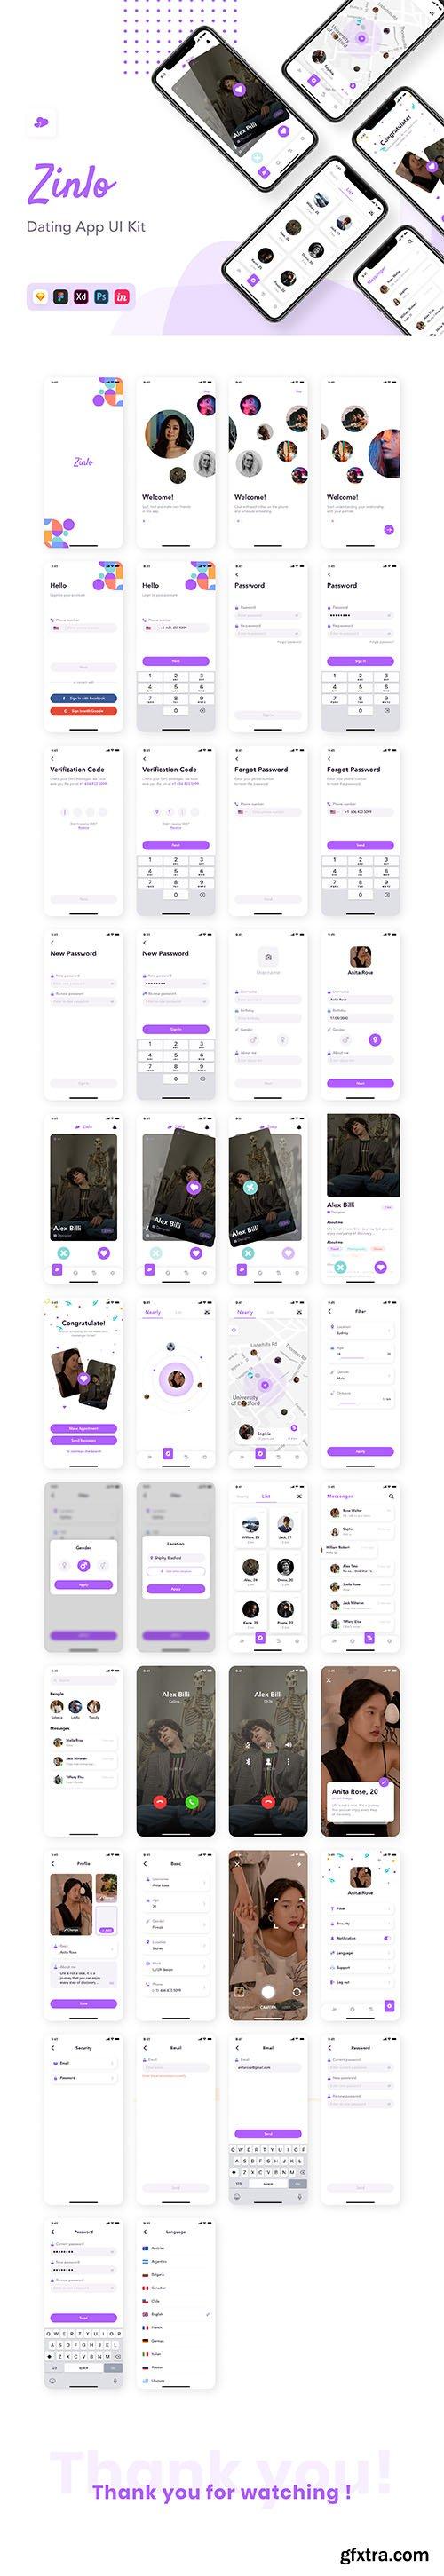 Zinlo - Dating App UI Kit